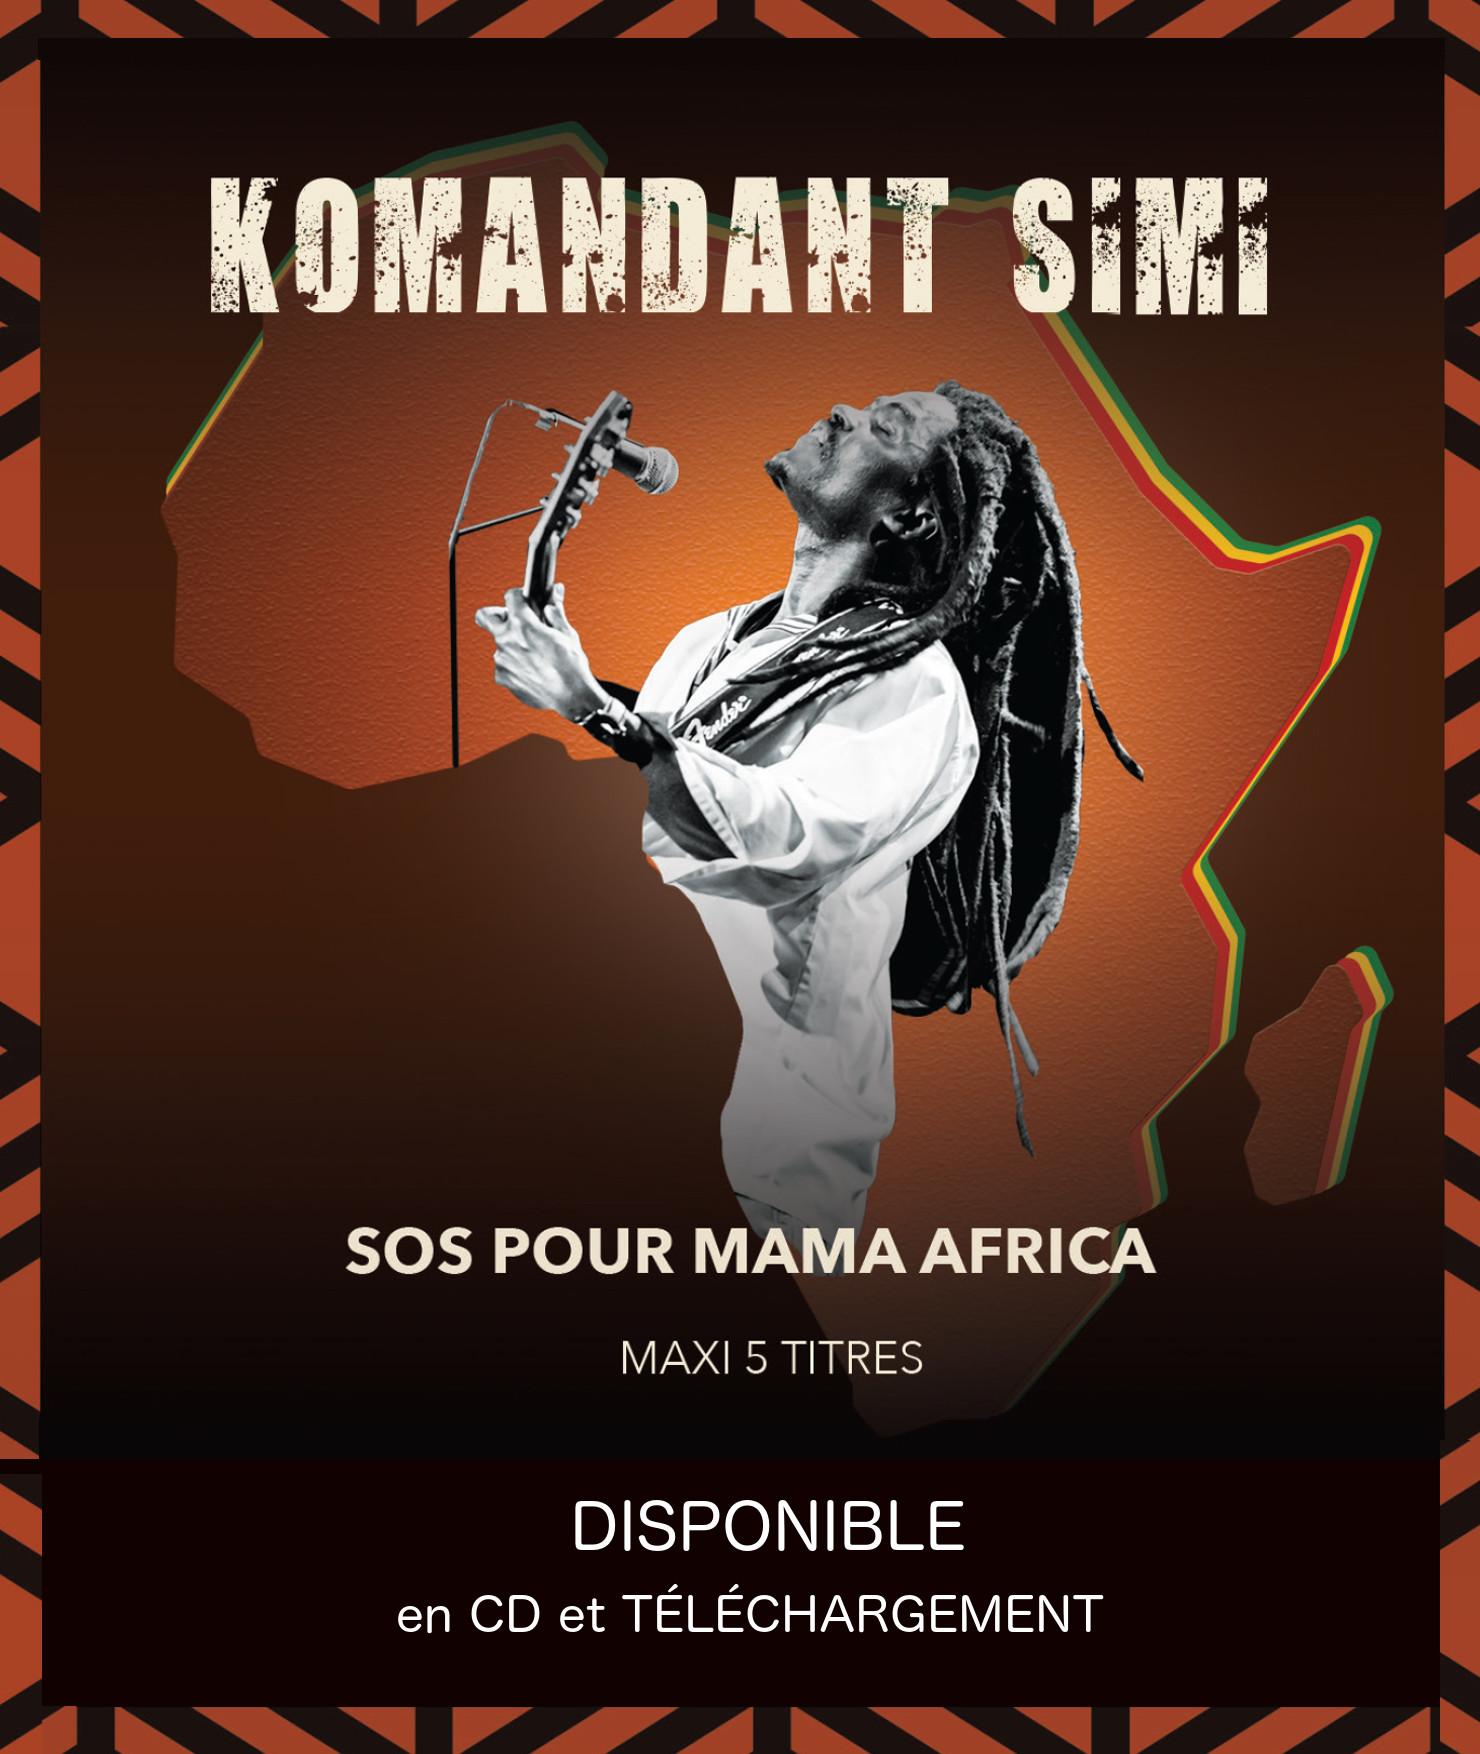 SOS POUR MAMA AFRICA : SORTIE DU CD